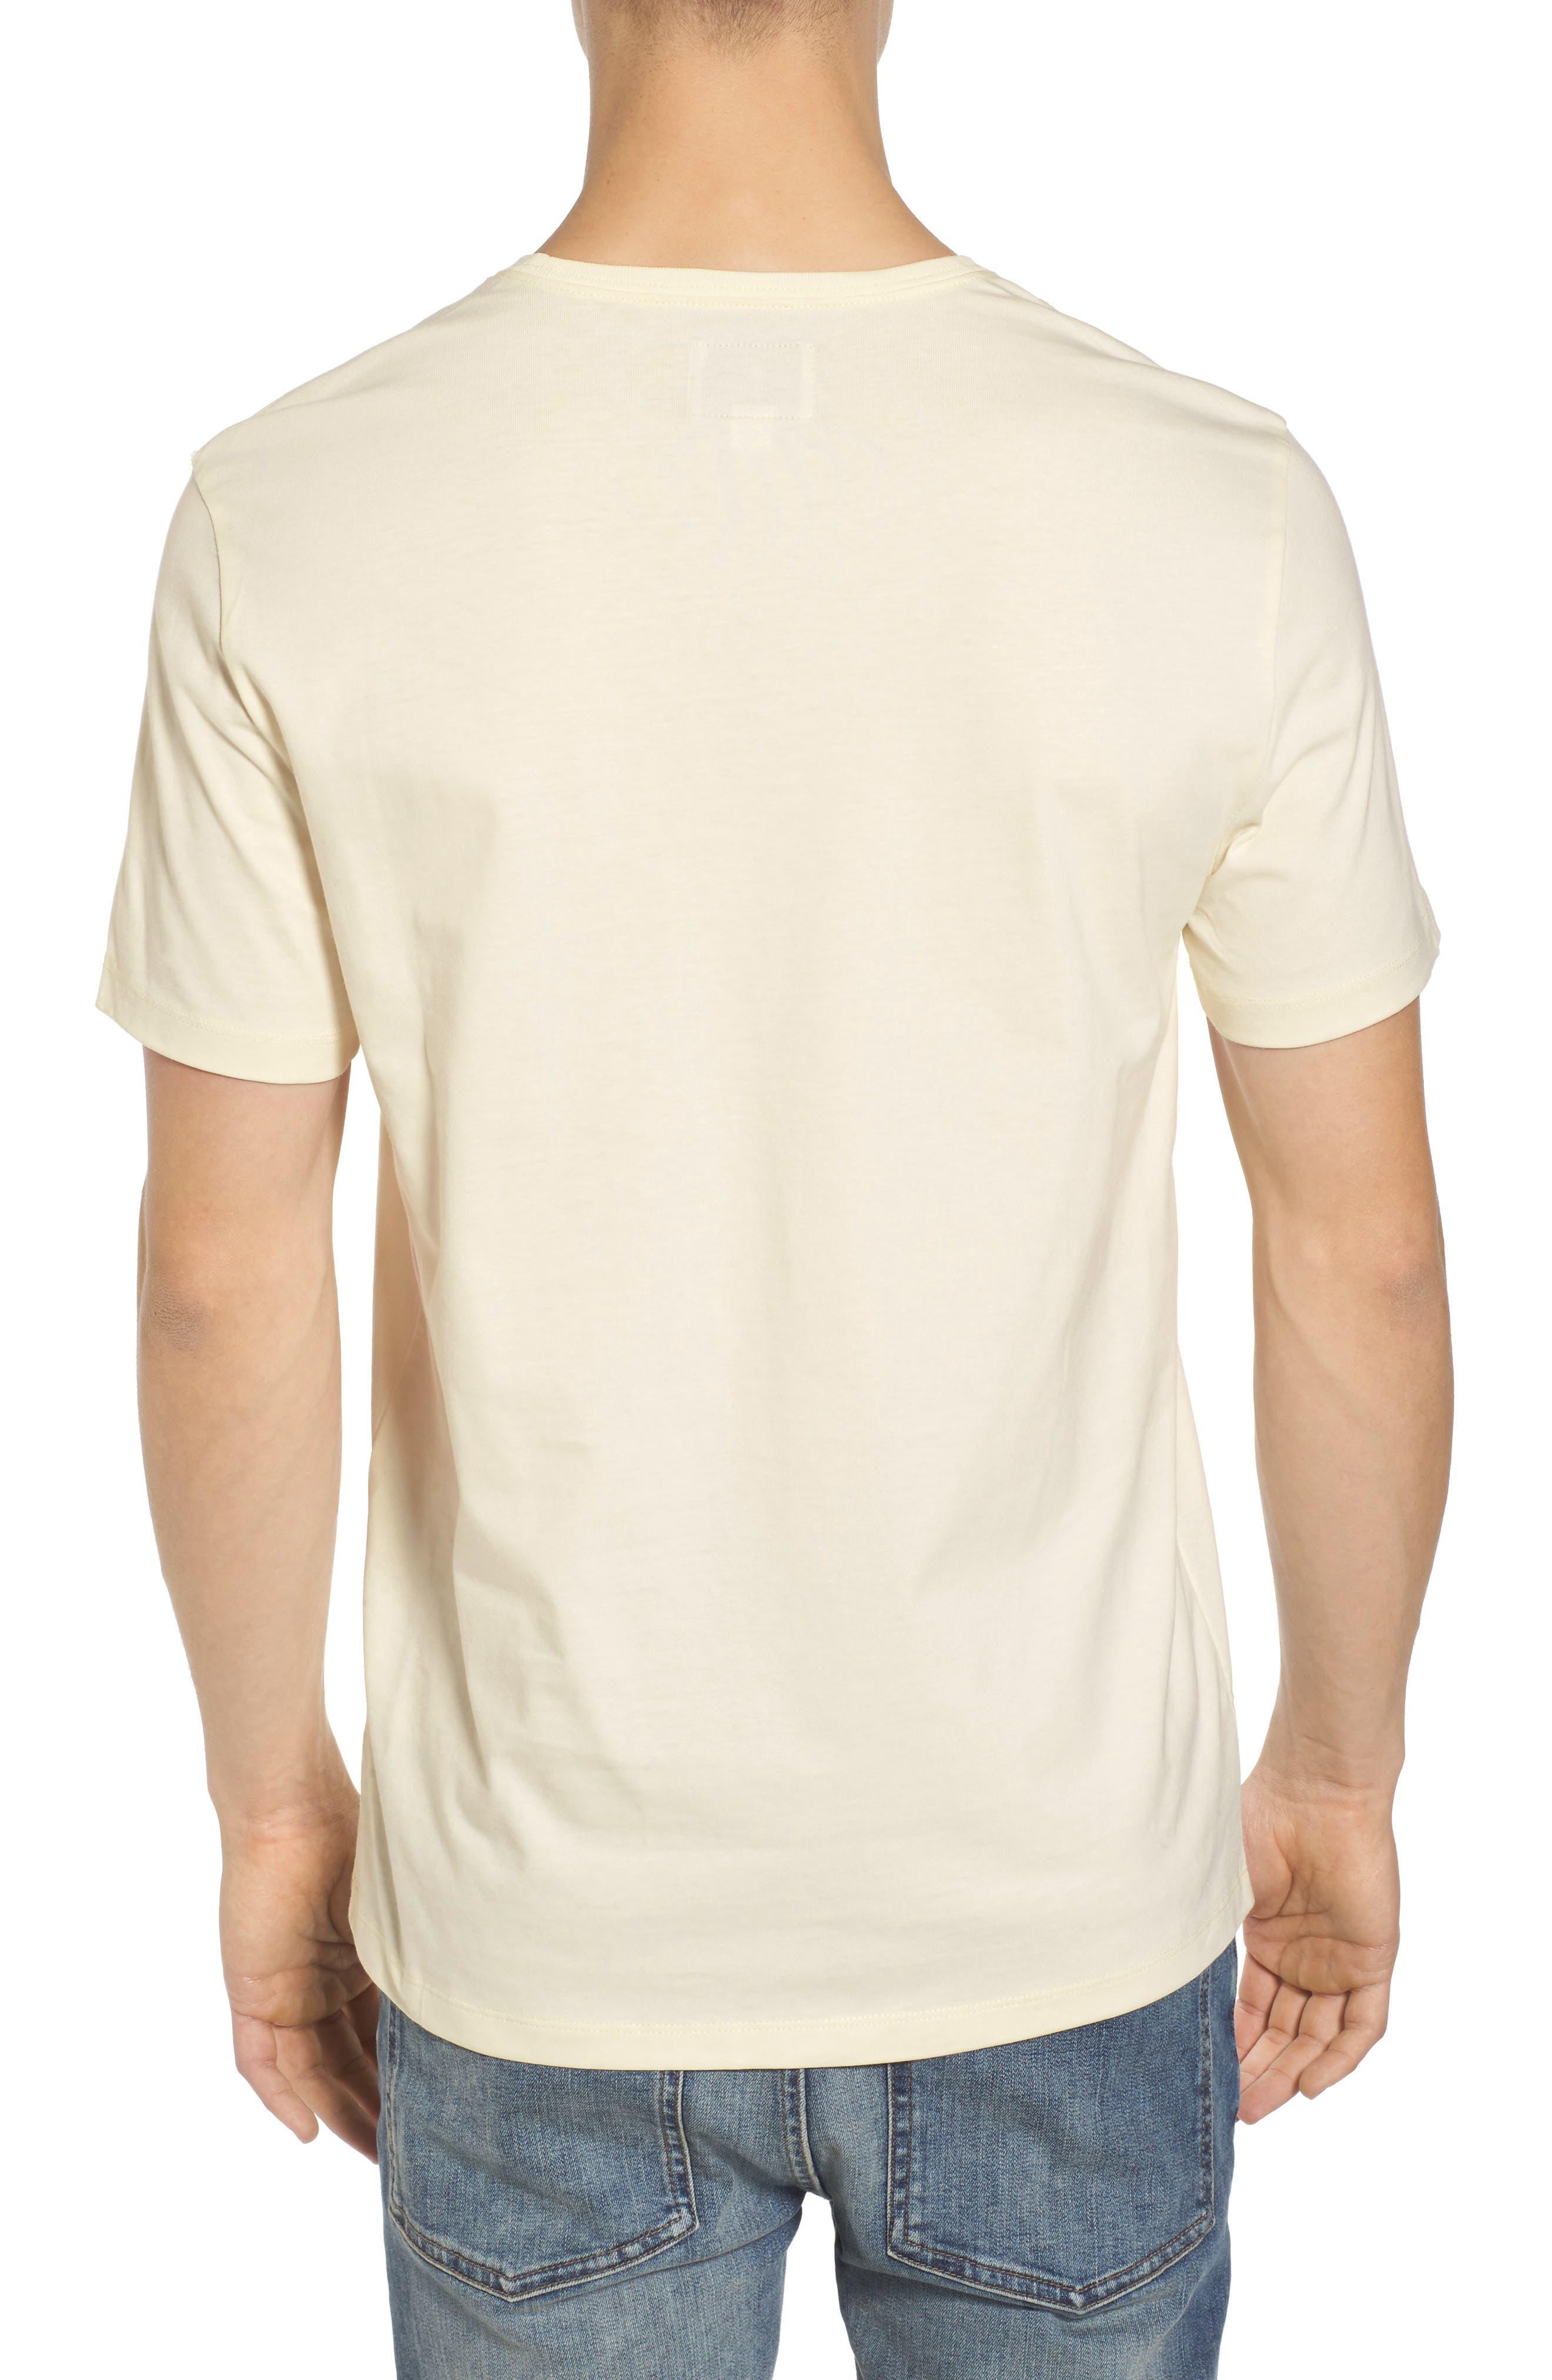 Alternate Image 2  - Calvin Klein Jeans Label Pocket T-Shirt